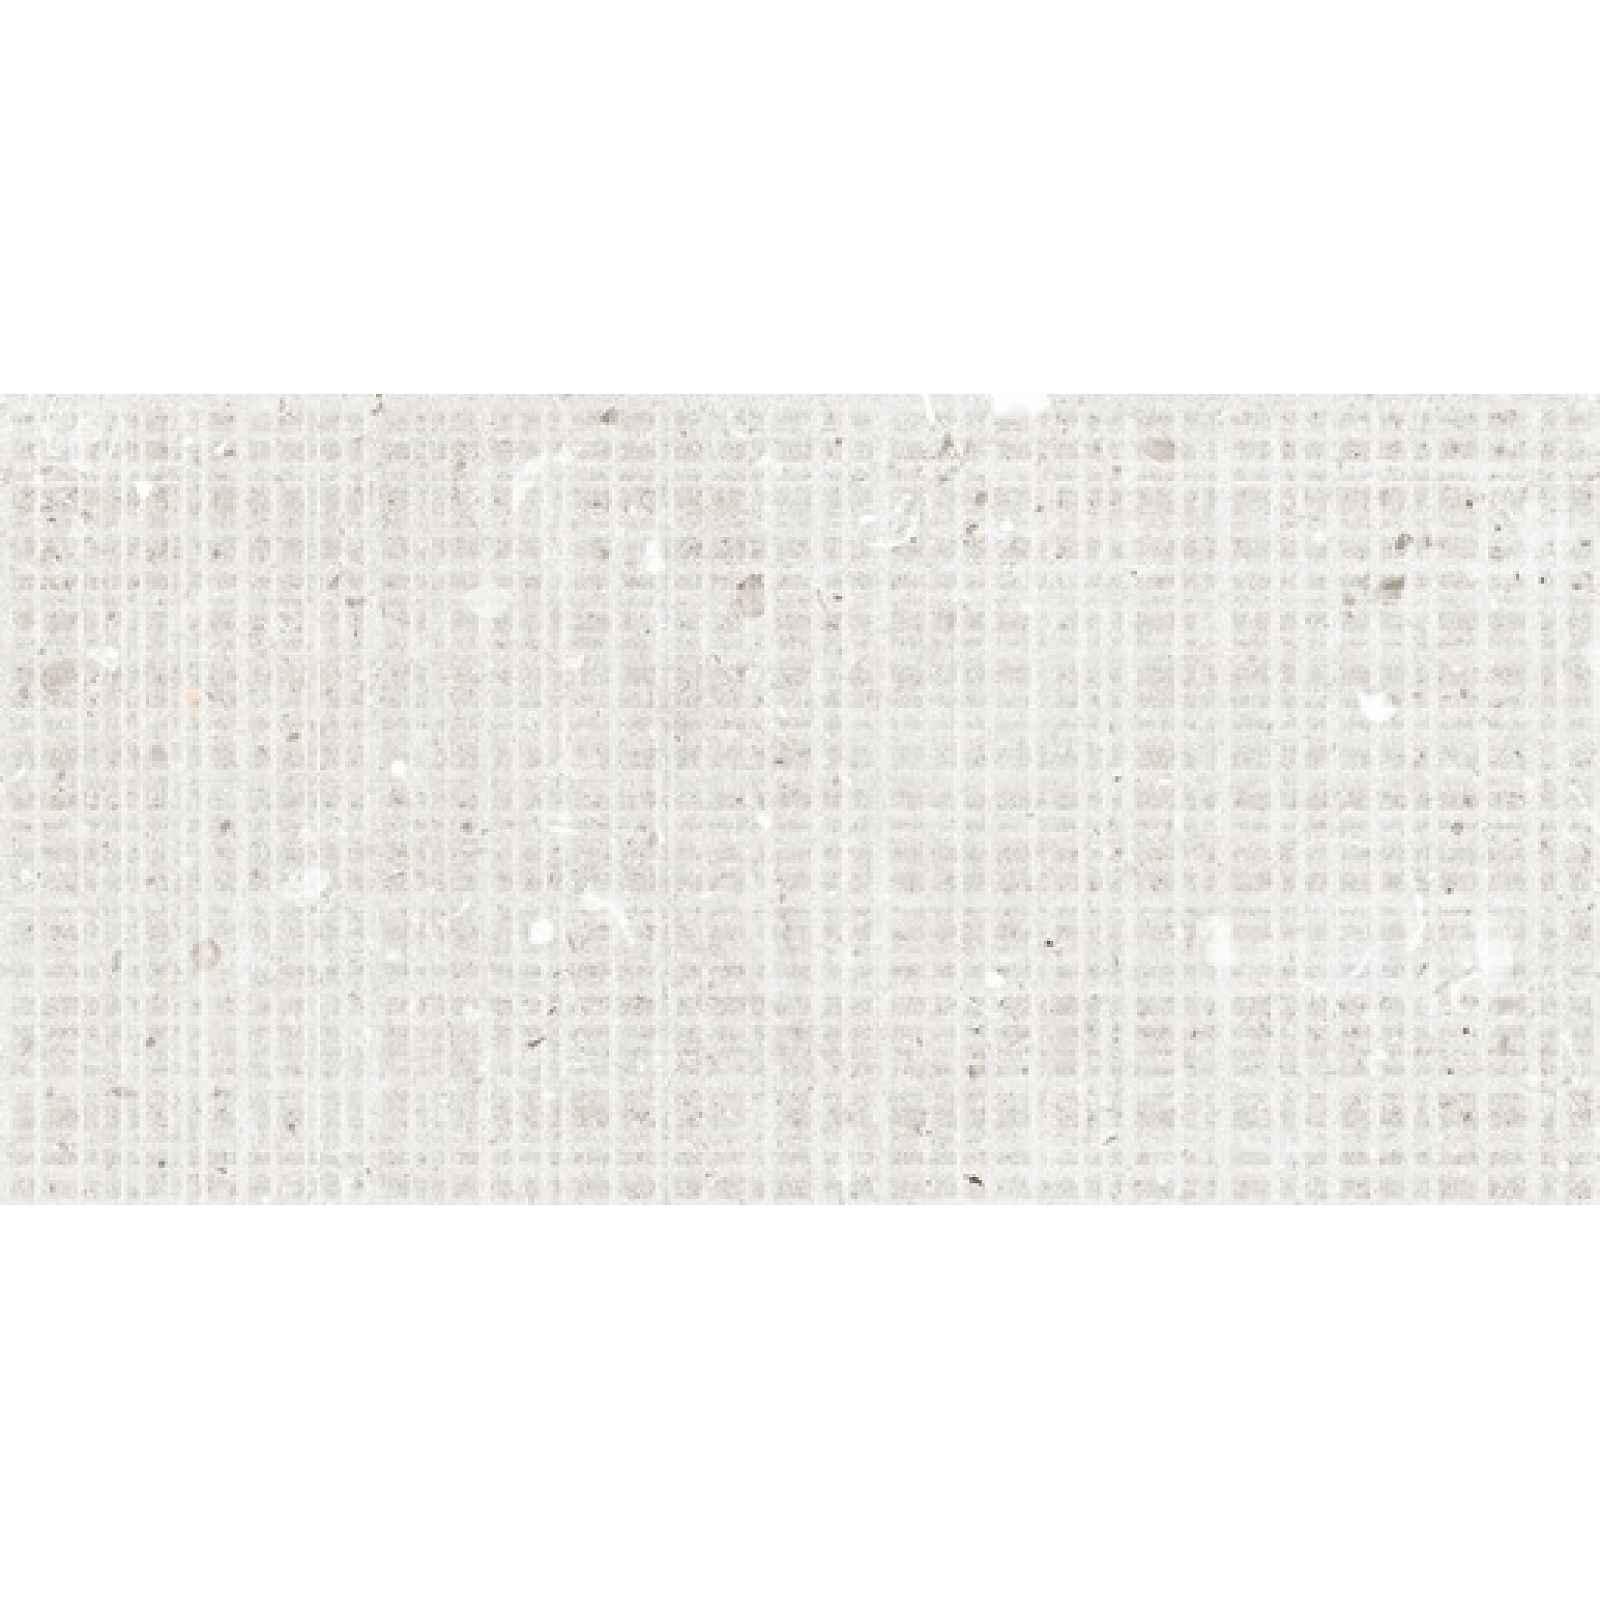 Dlažba Provenza Alter Ego avorio 30x60 cm mat EGRC